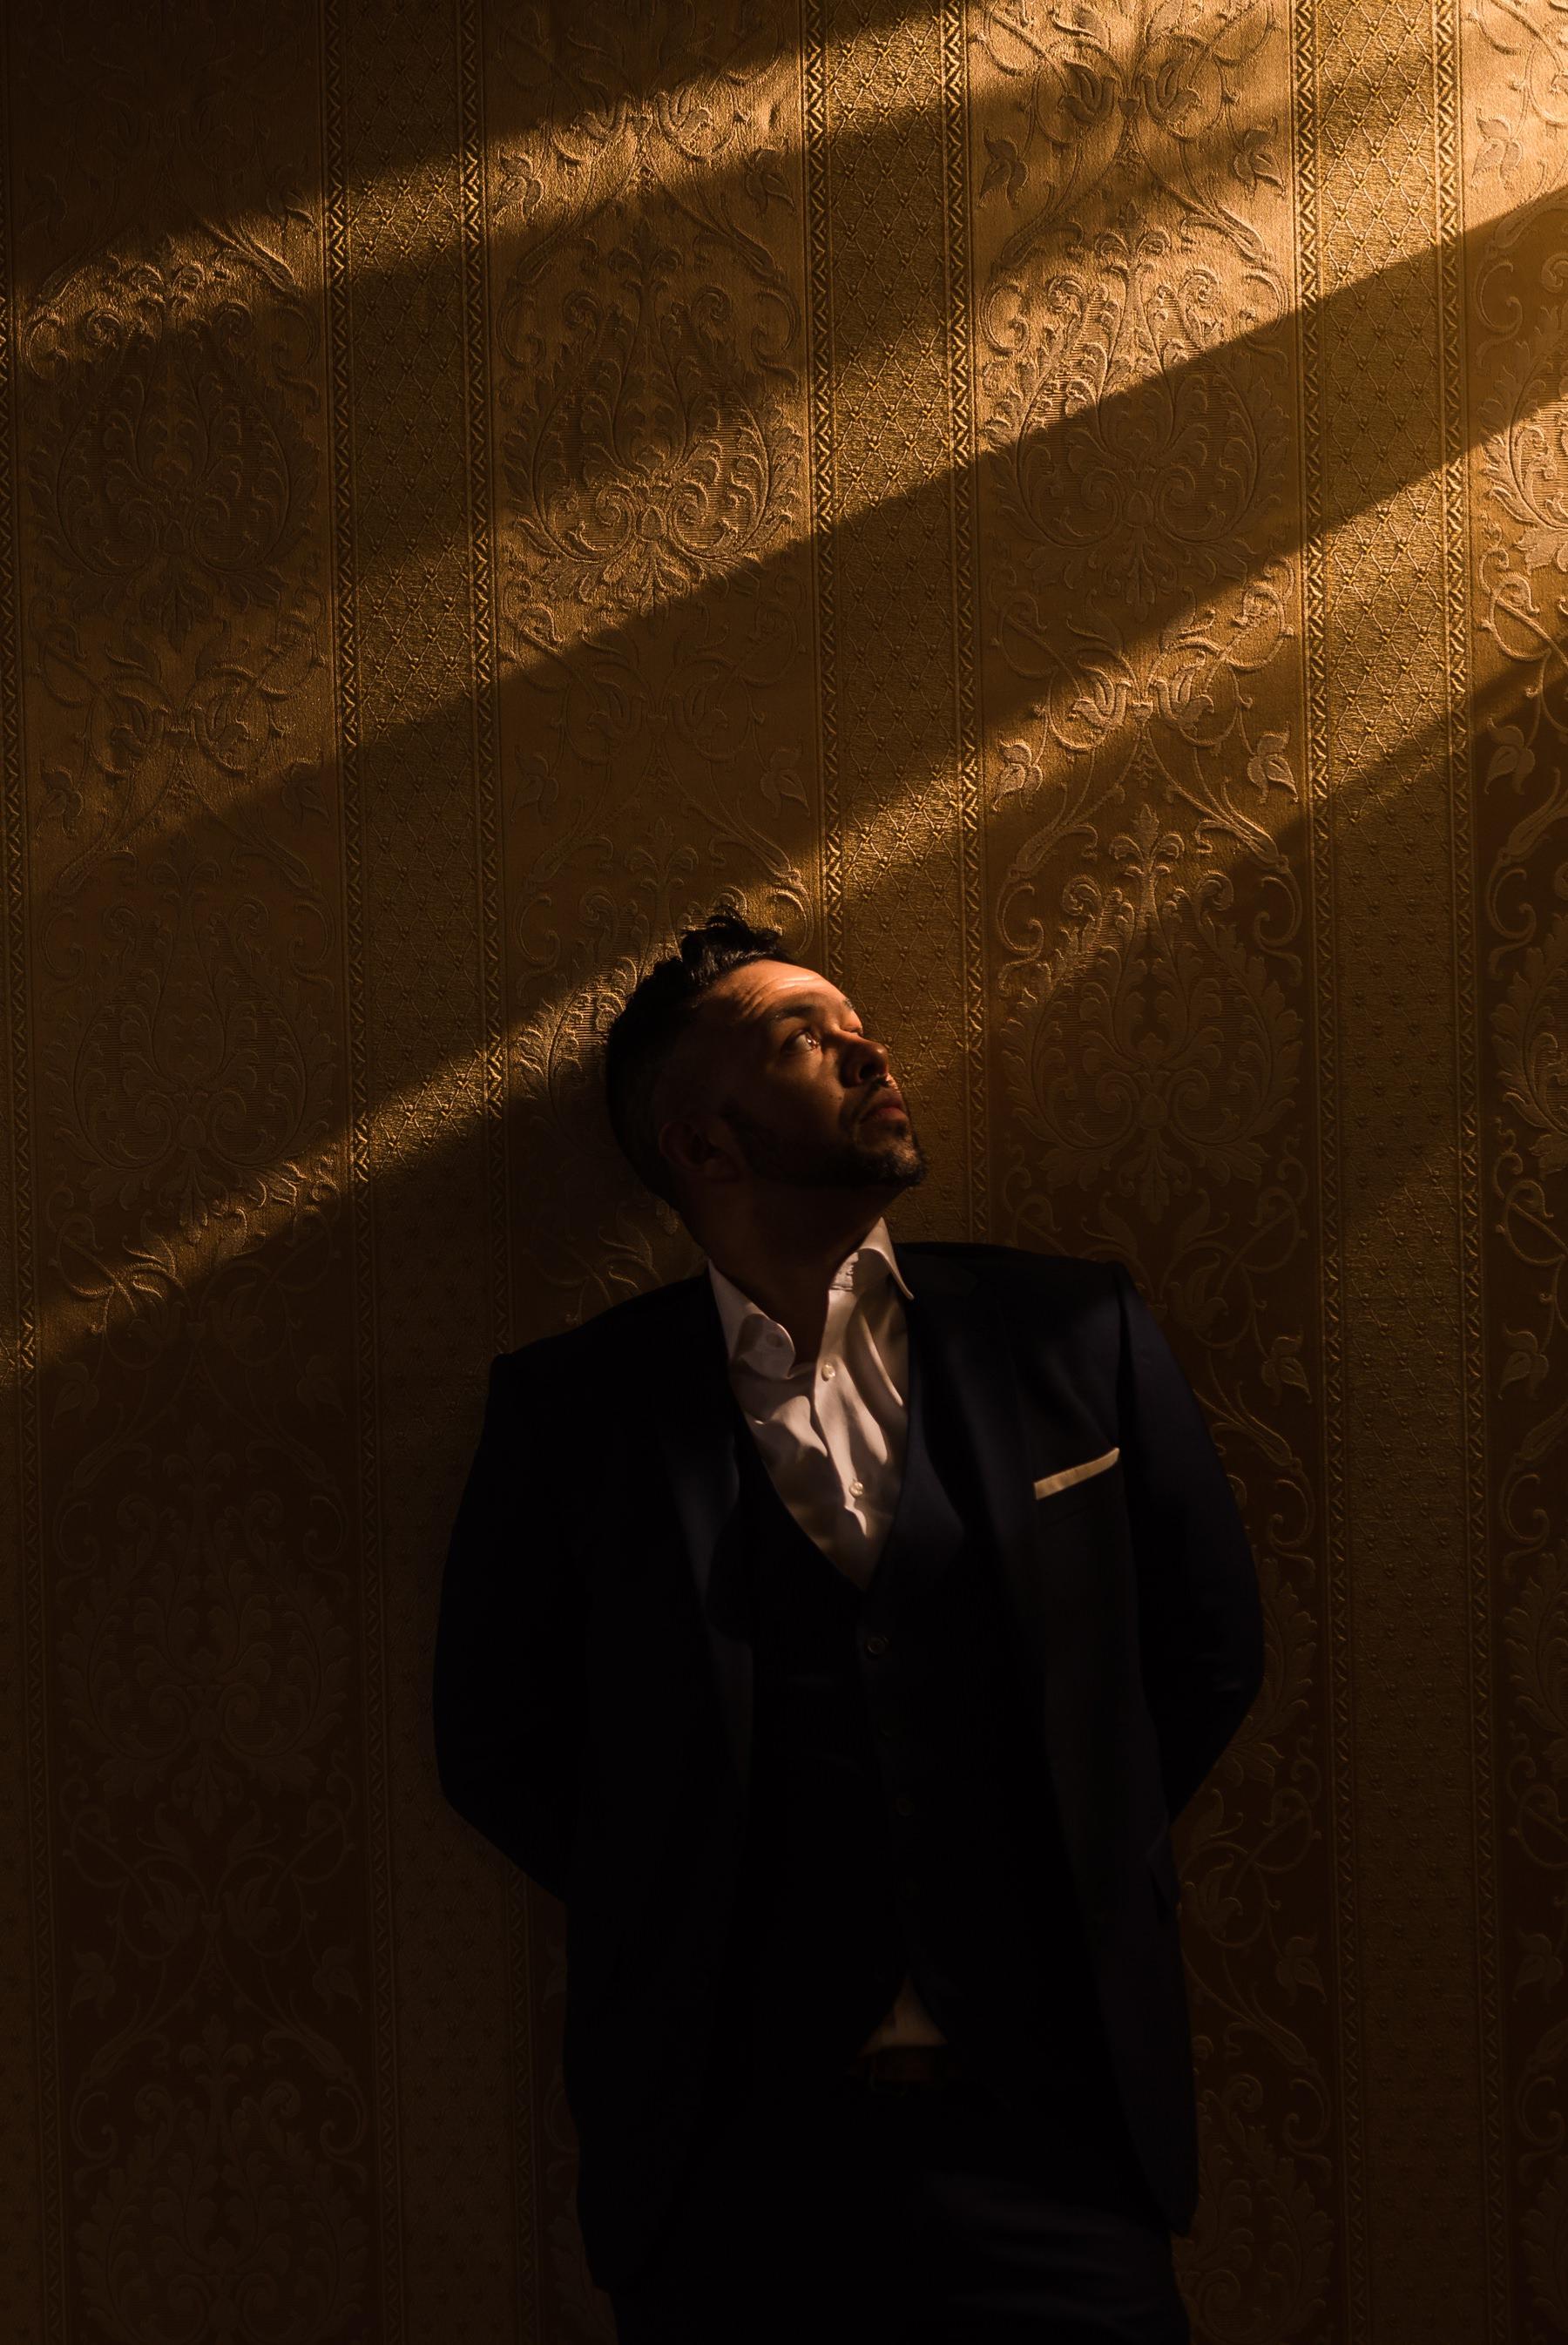 Palazzo Cavalli Venice grooms portrait whit textured light